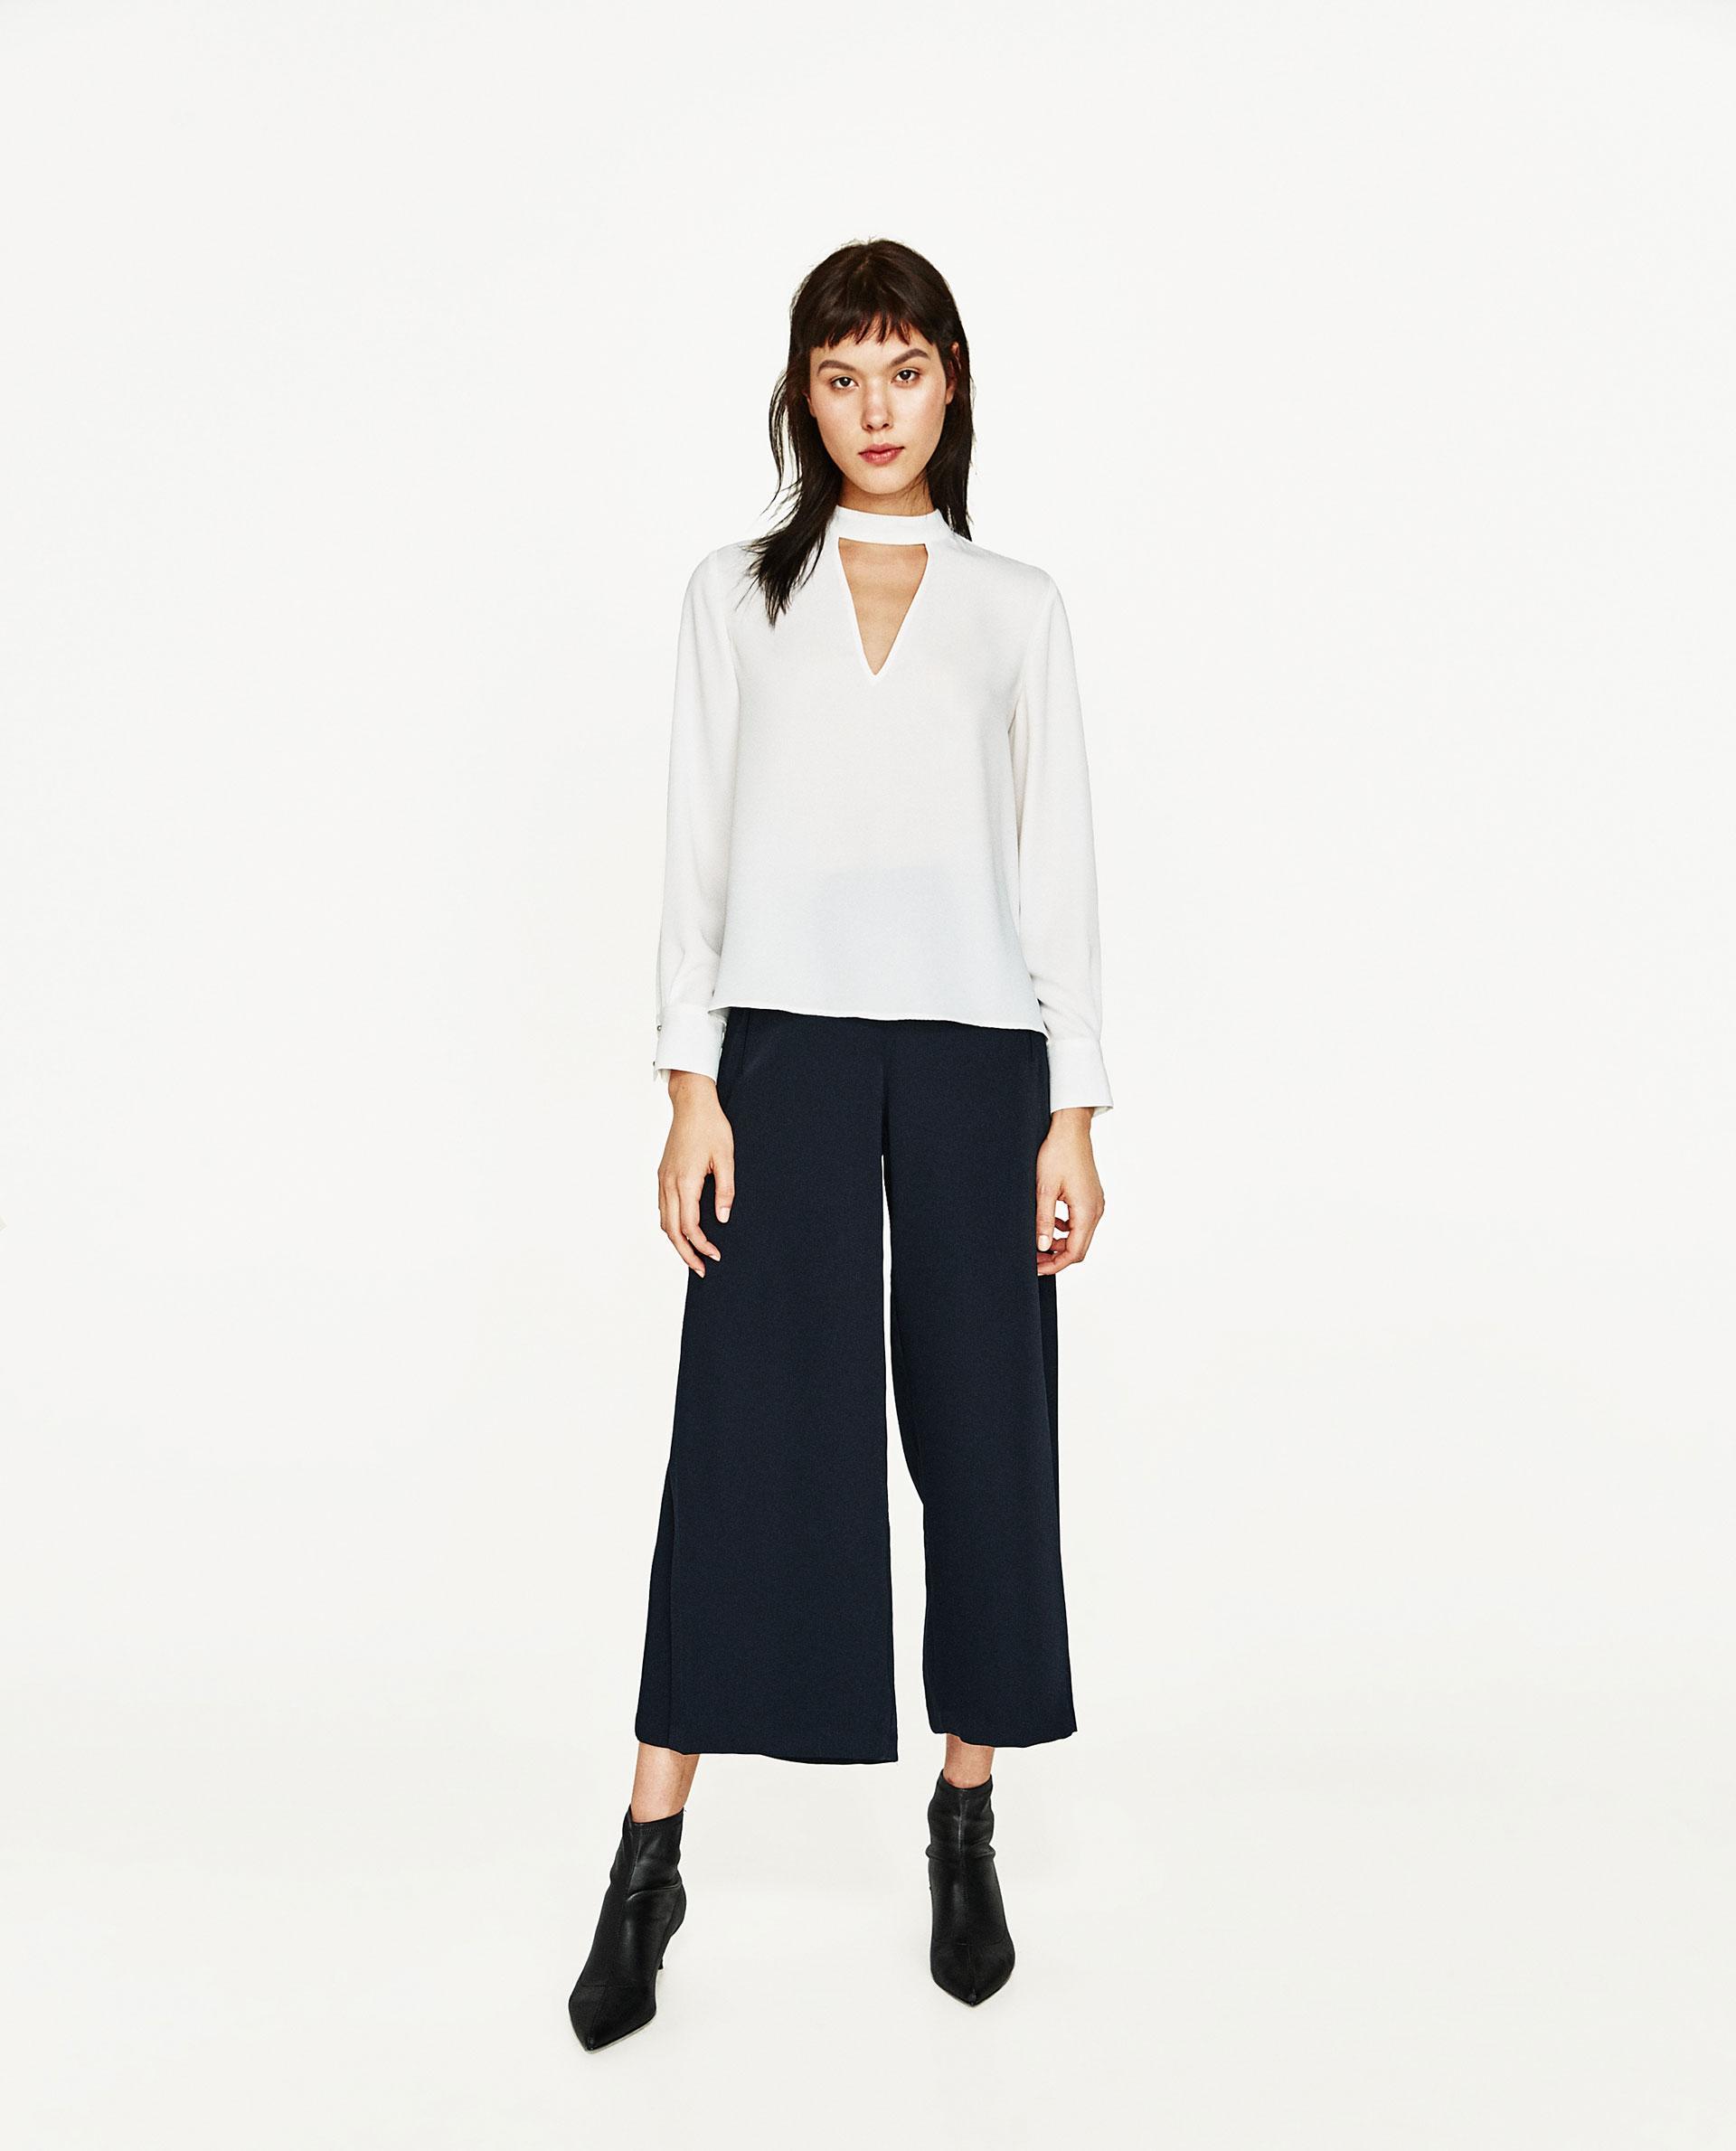 Zara V Neck Blouse 111